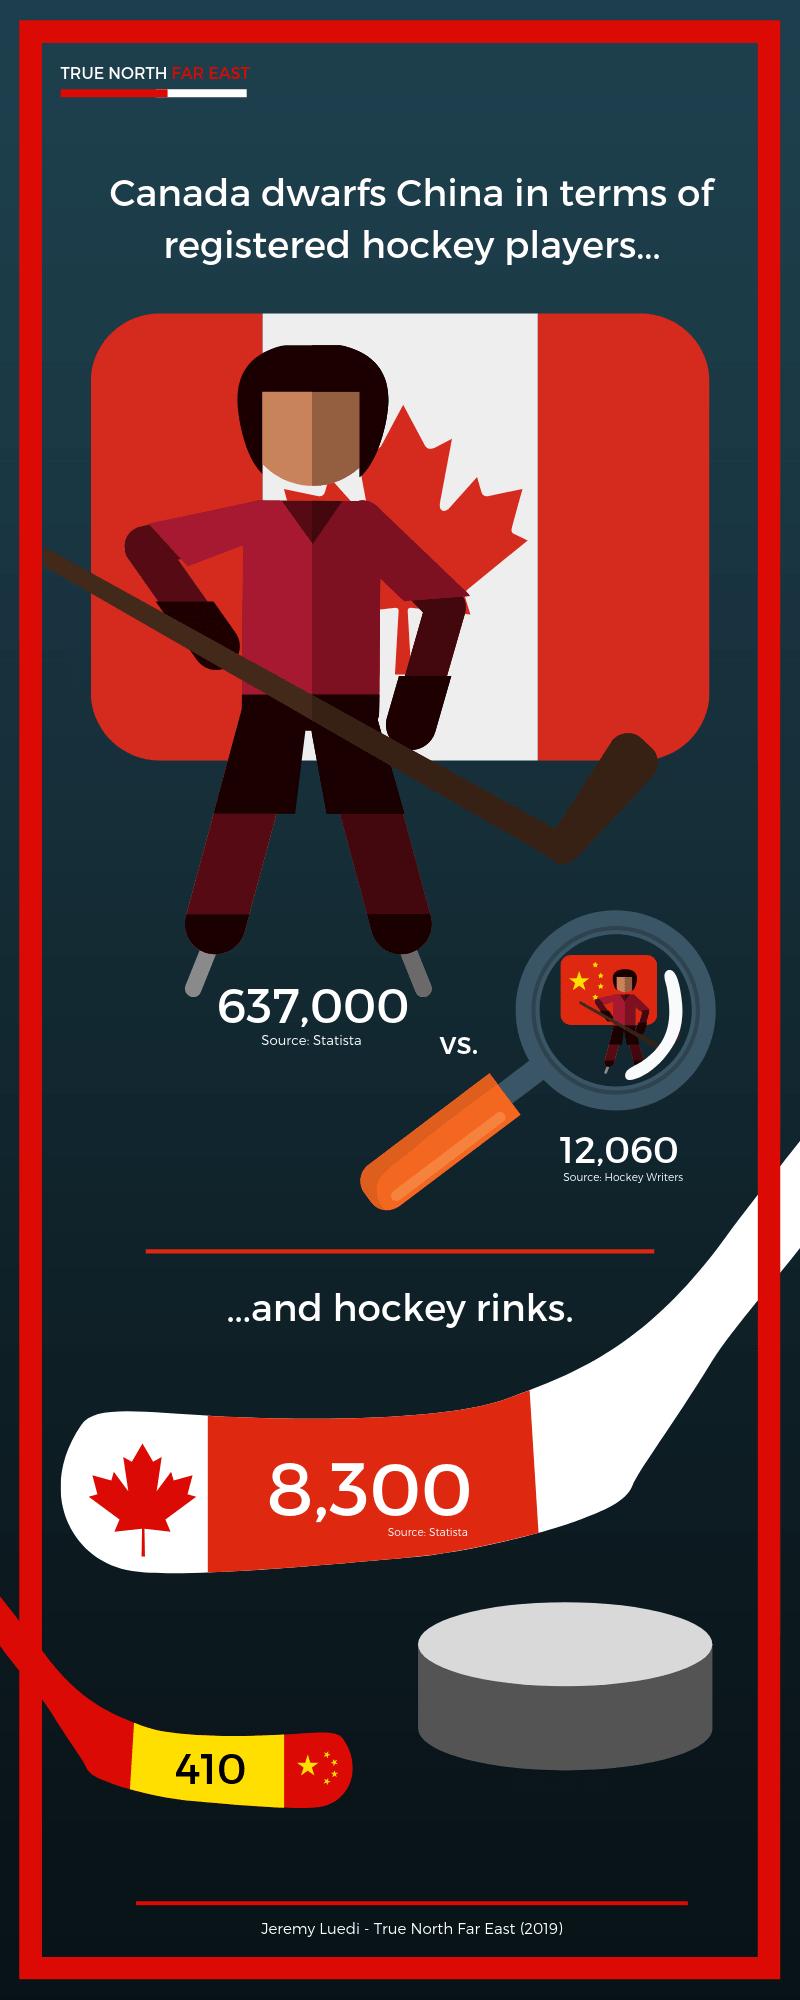 hockey-players-Canada-China-statistics